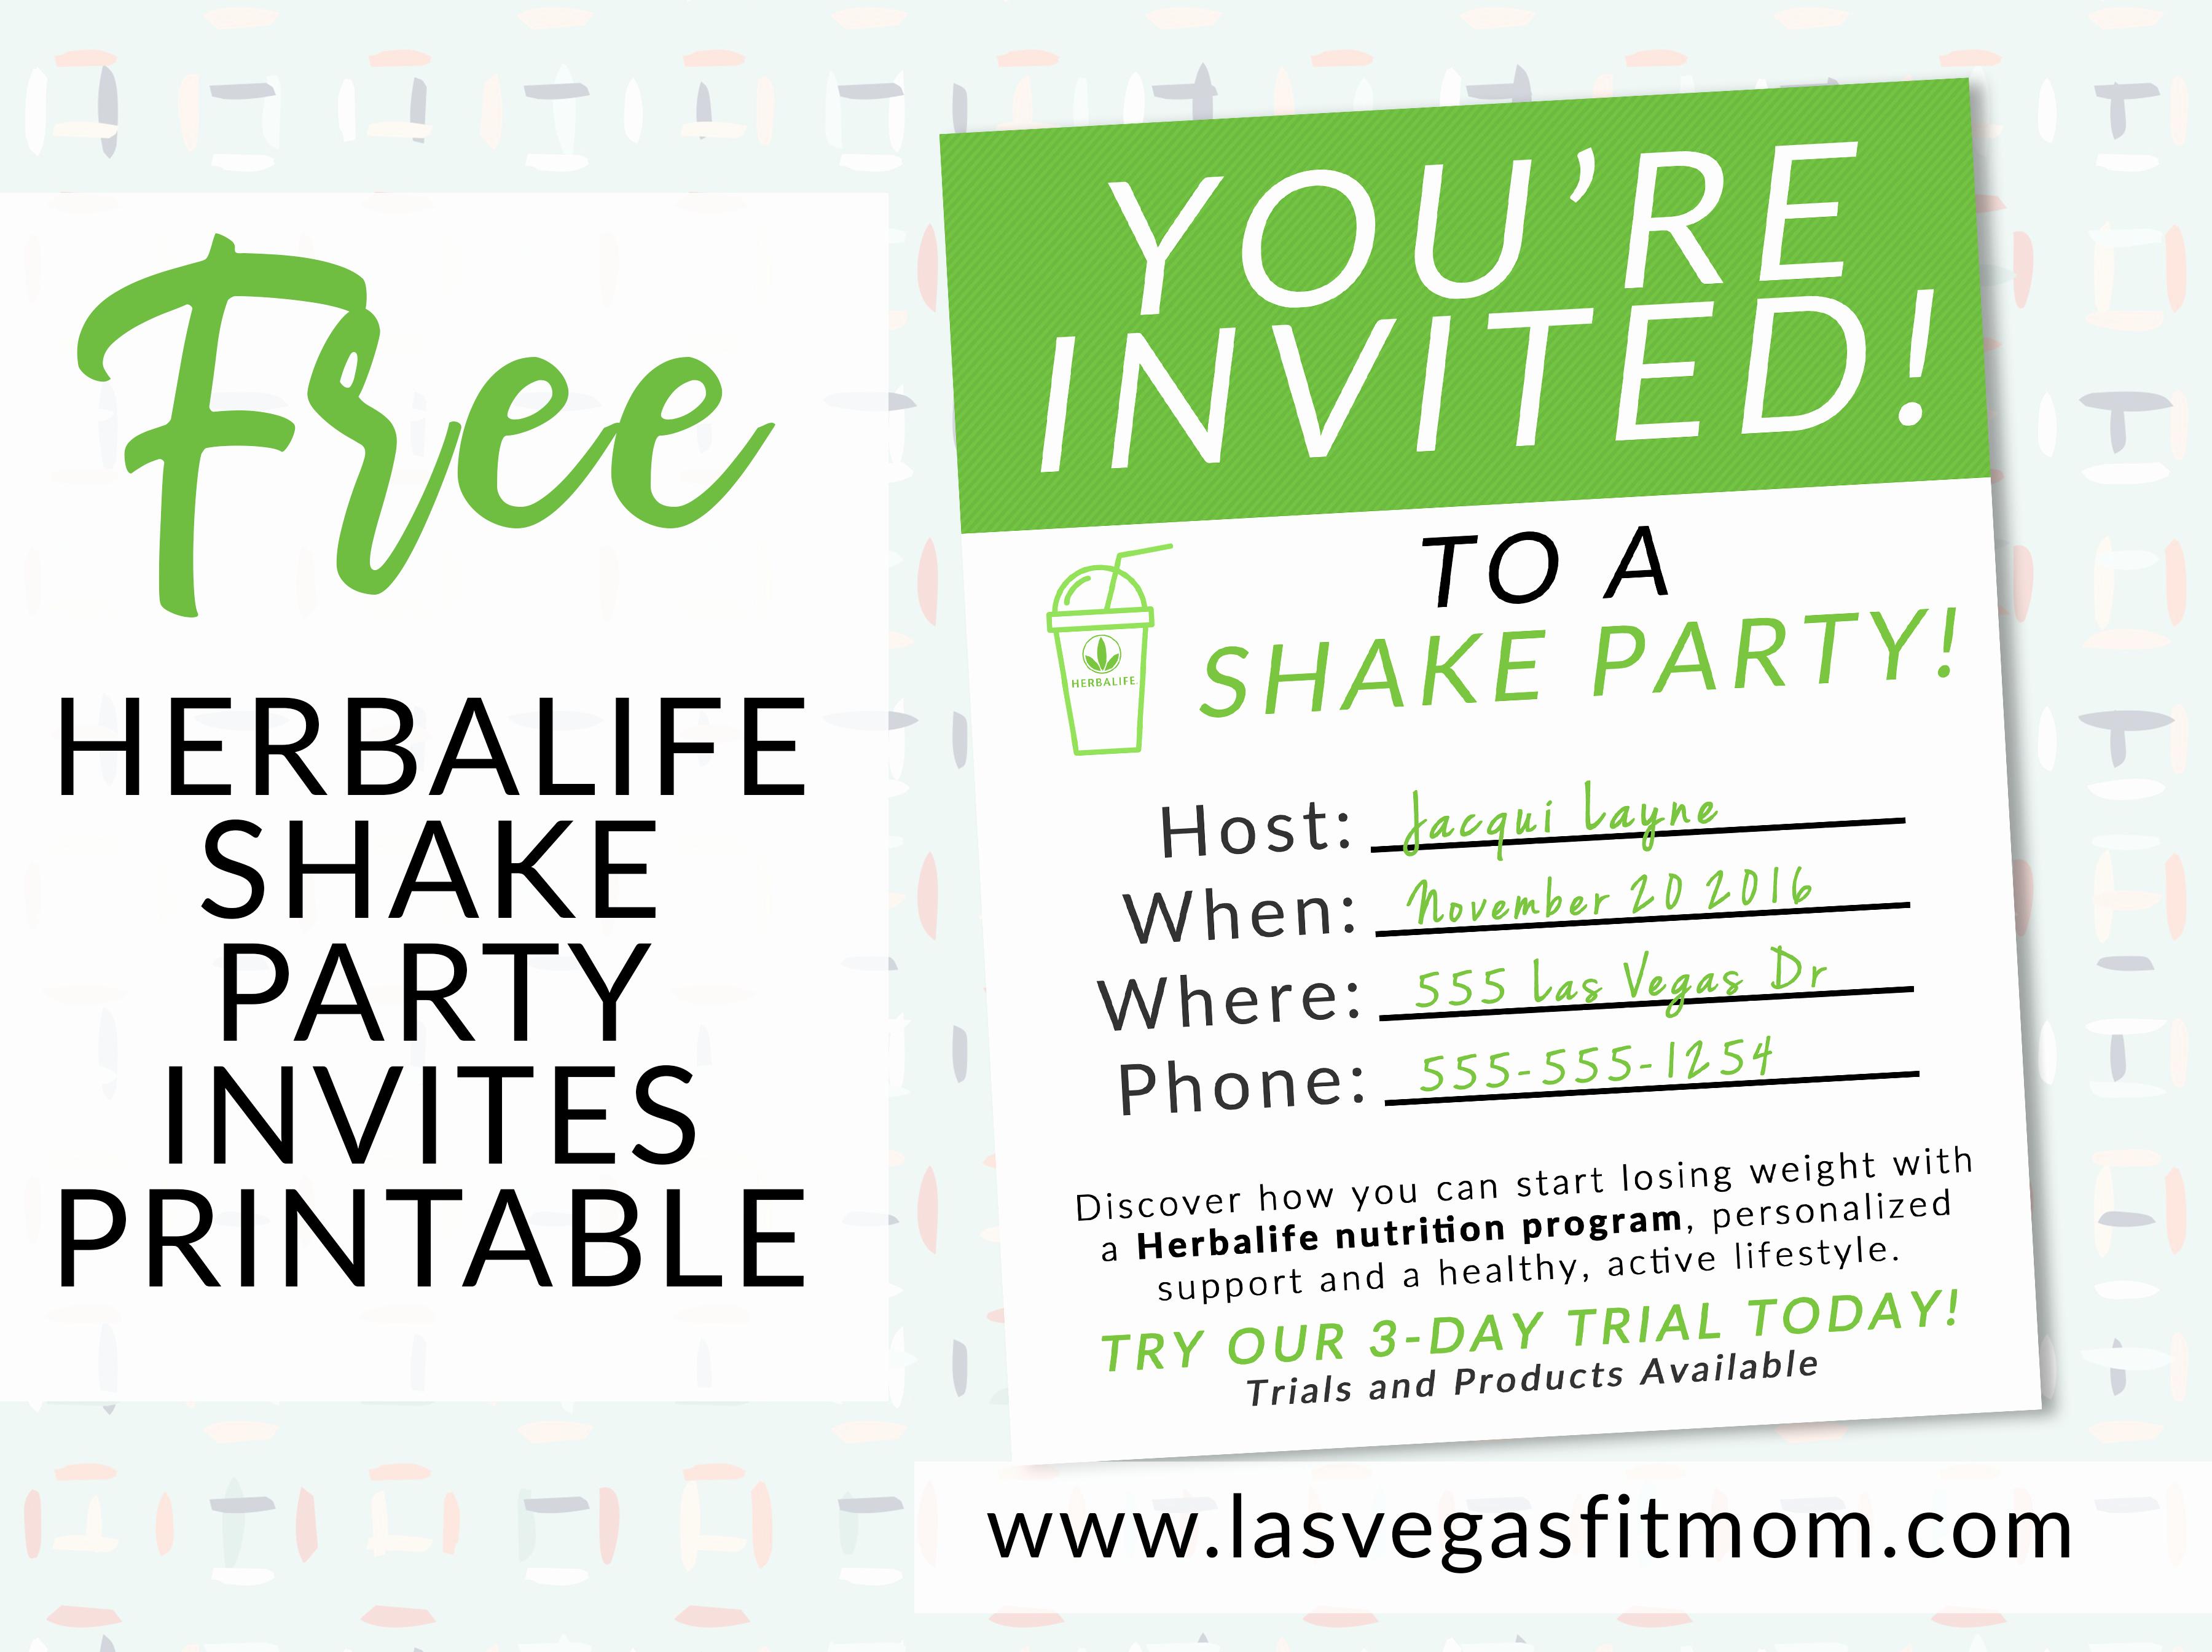 Herbalife Shake Party Luxury Herbalife Shake Party Invites – Free Printable – Las Vegas